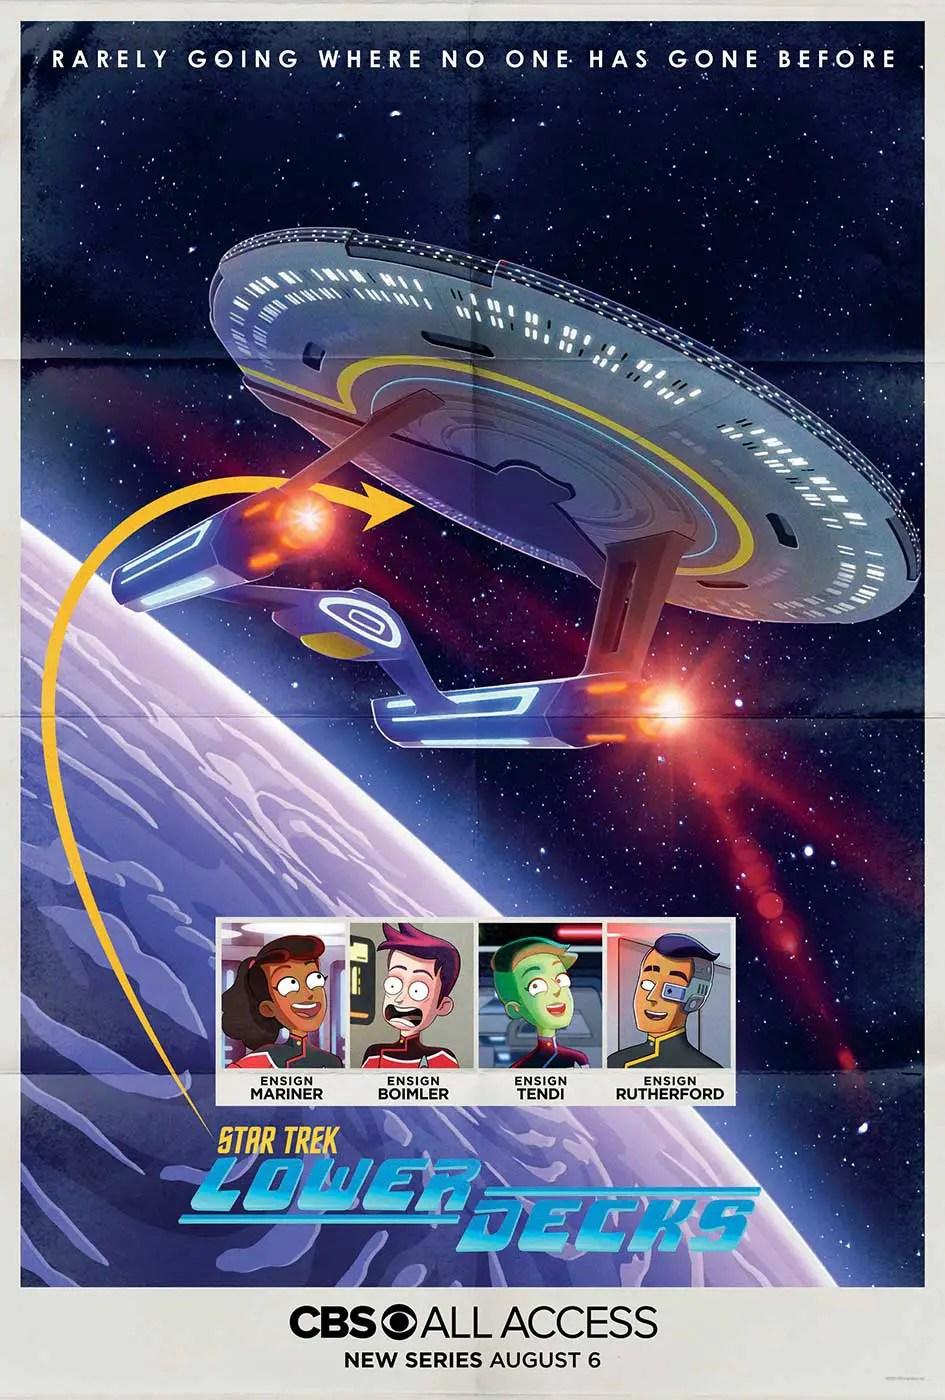 Star Trek: Lower Decks Crew Poster